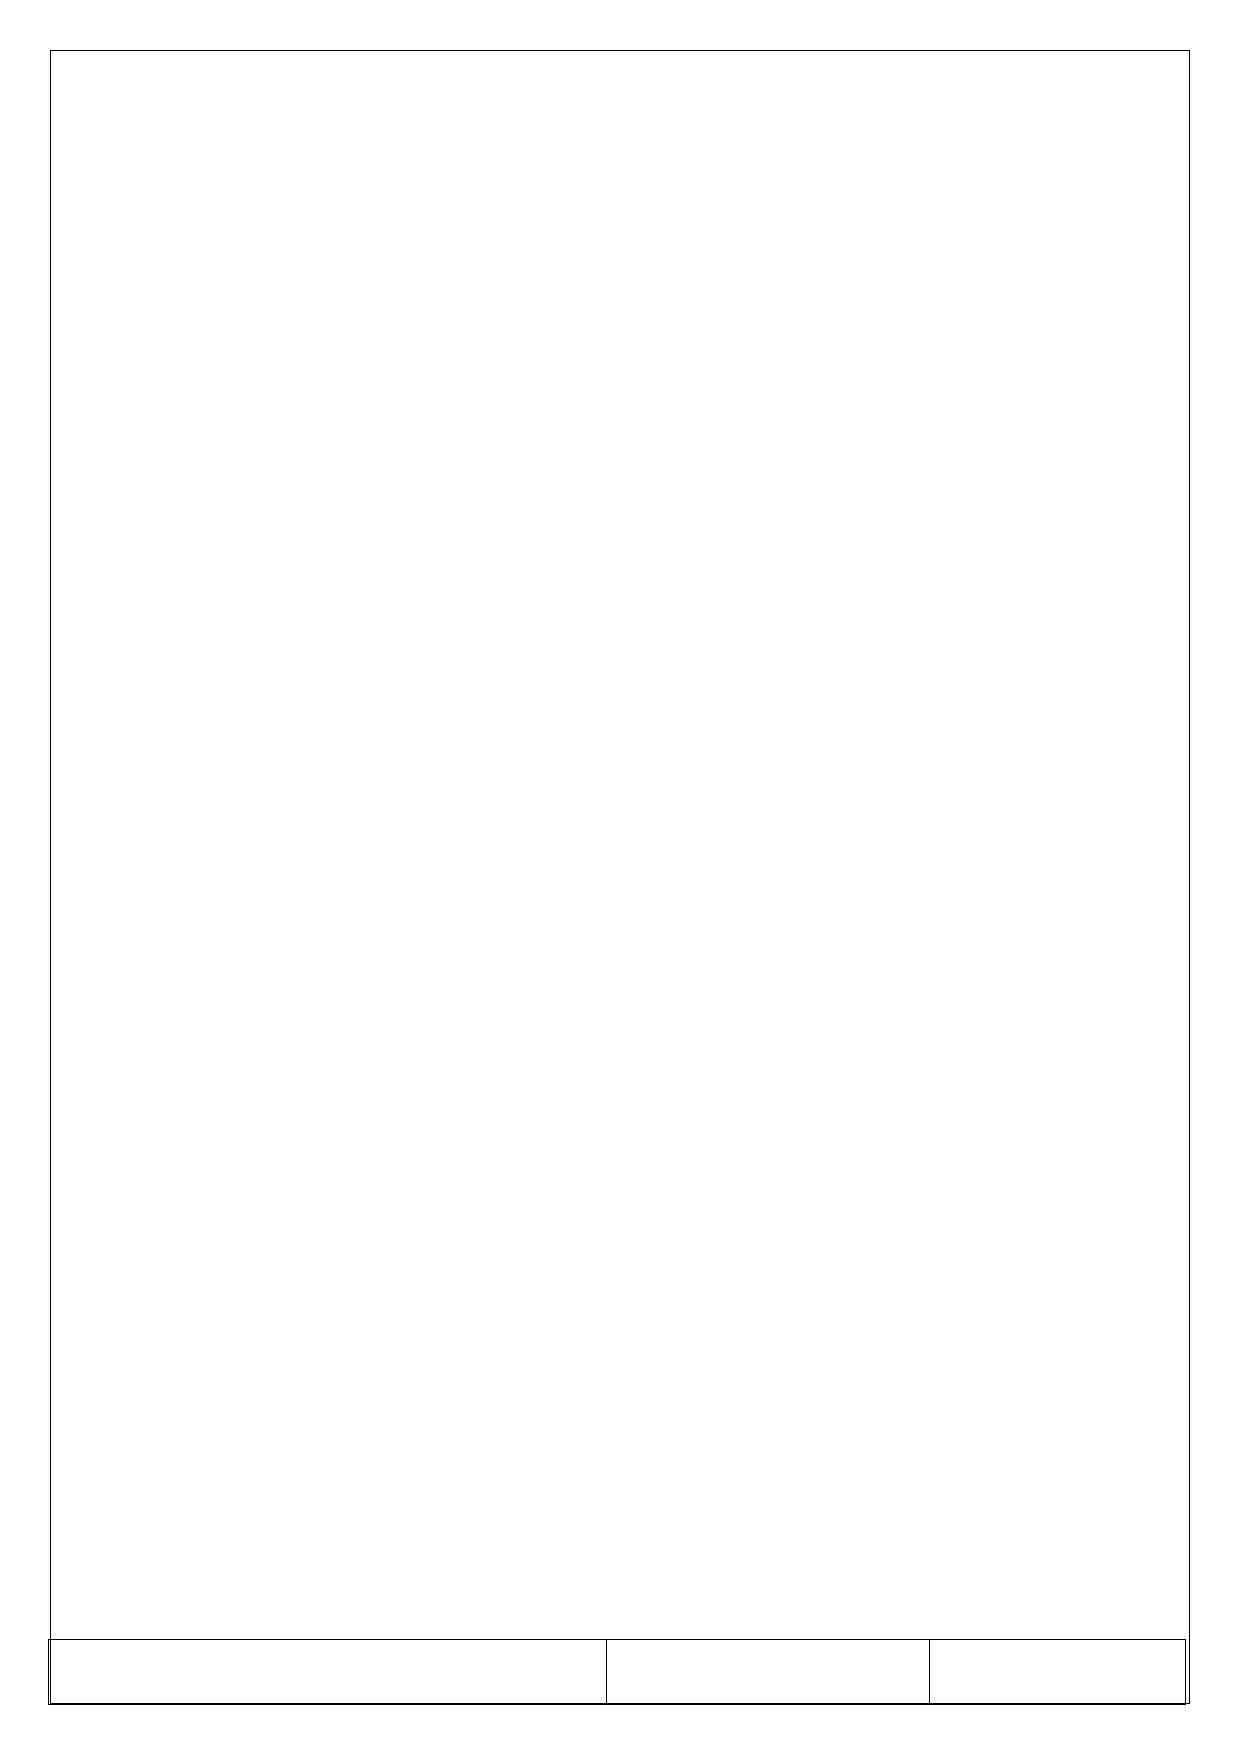 GS-GB1286433YFYJ-R pdf, ピン配列